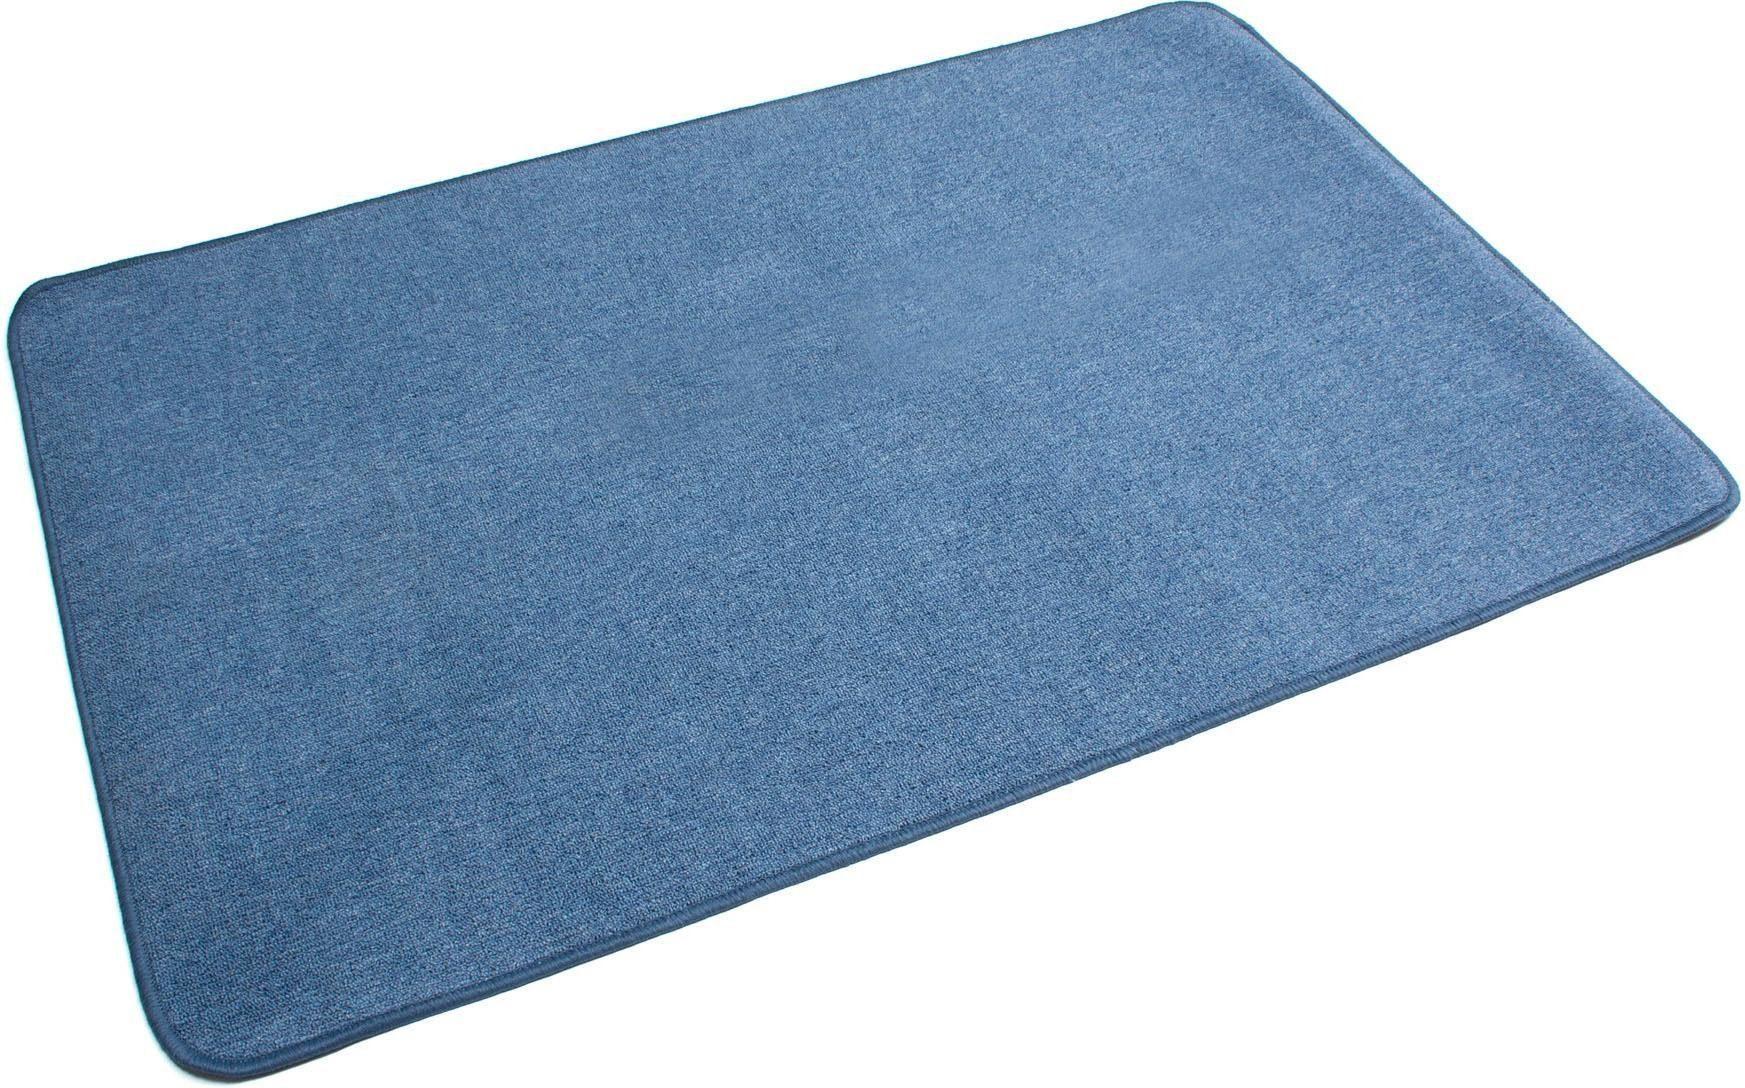 Teppich MACAO Primaflor-Ideen in Textil rechteckig Höhe 5 mm